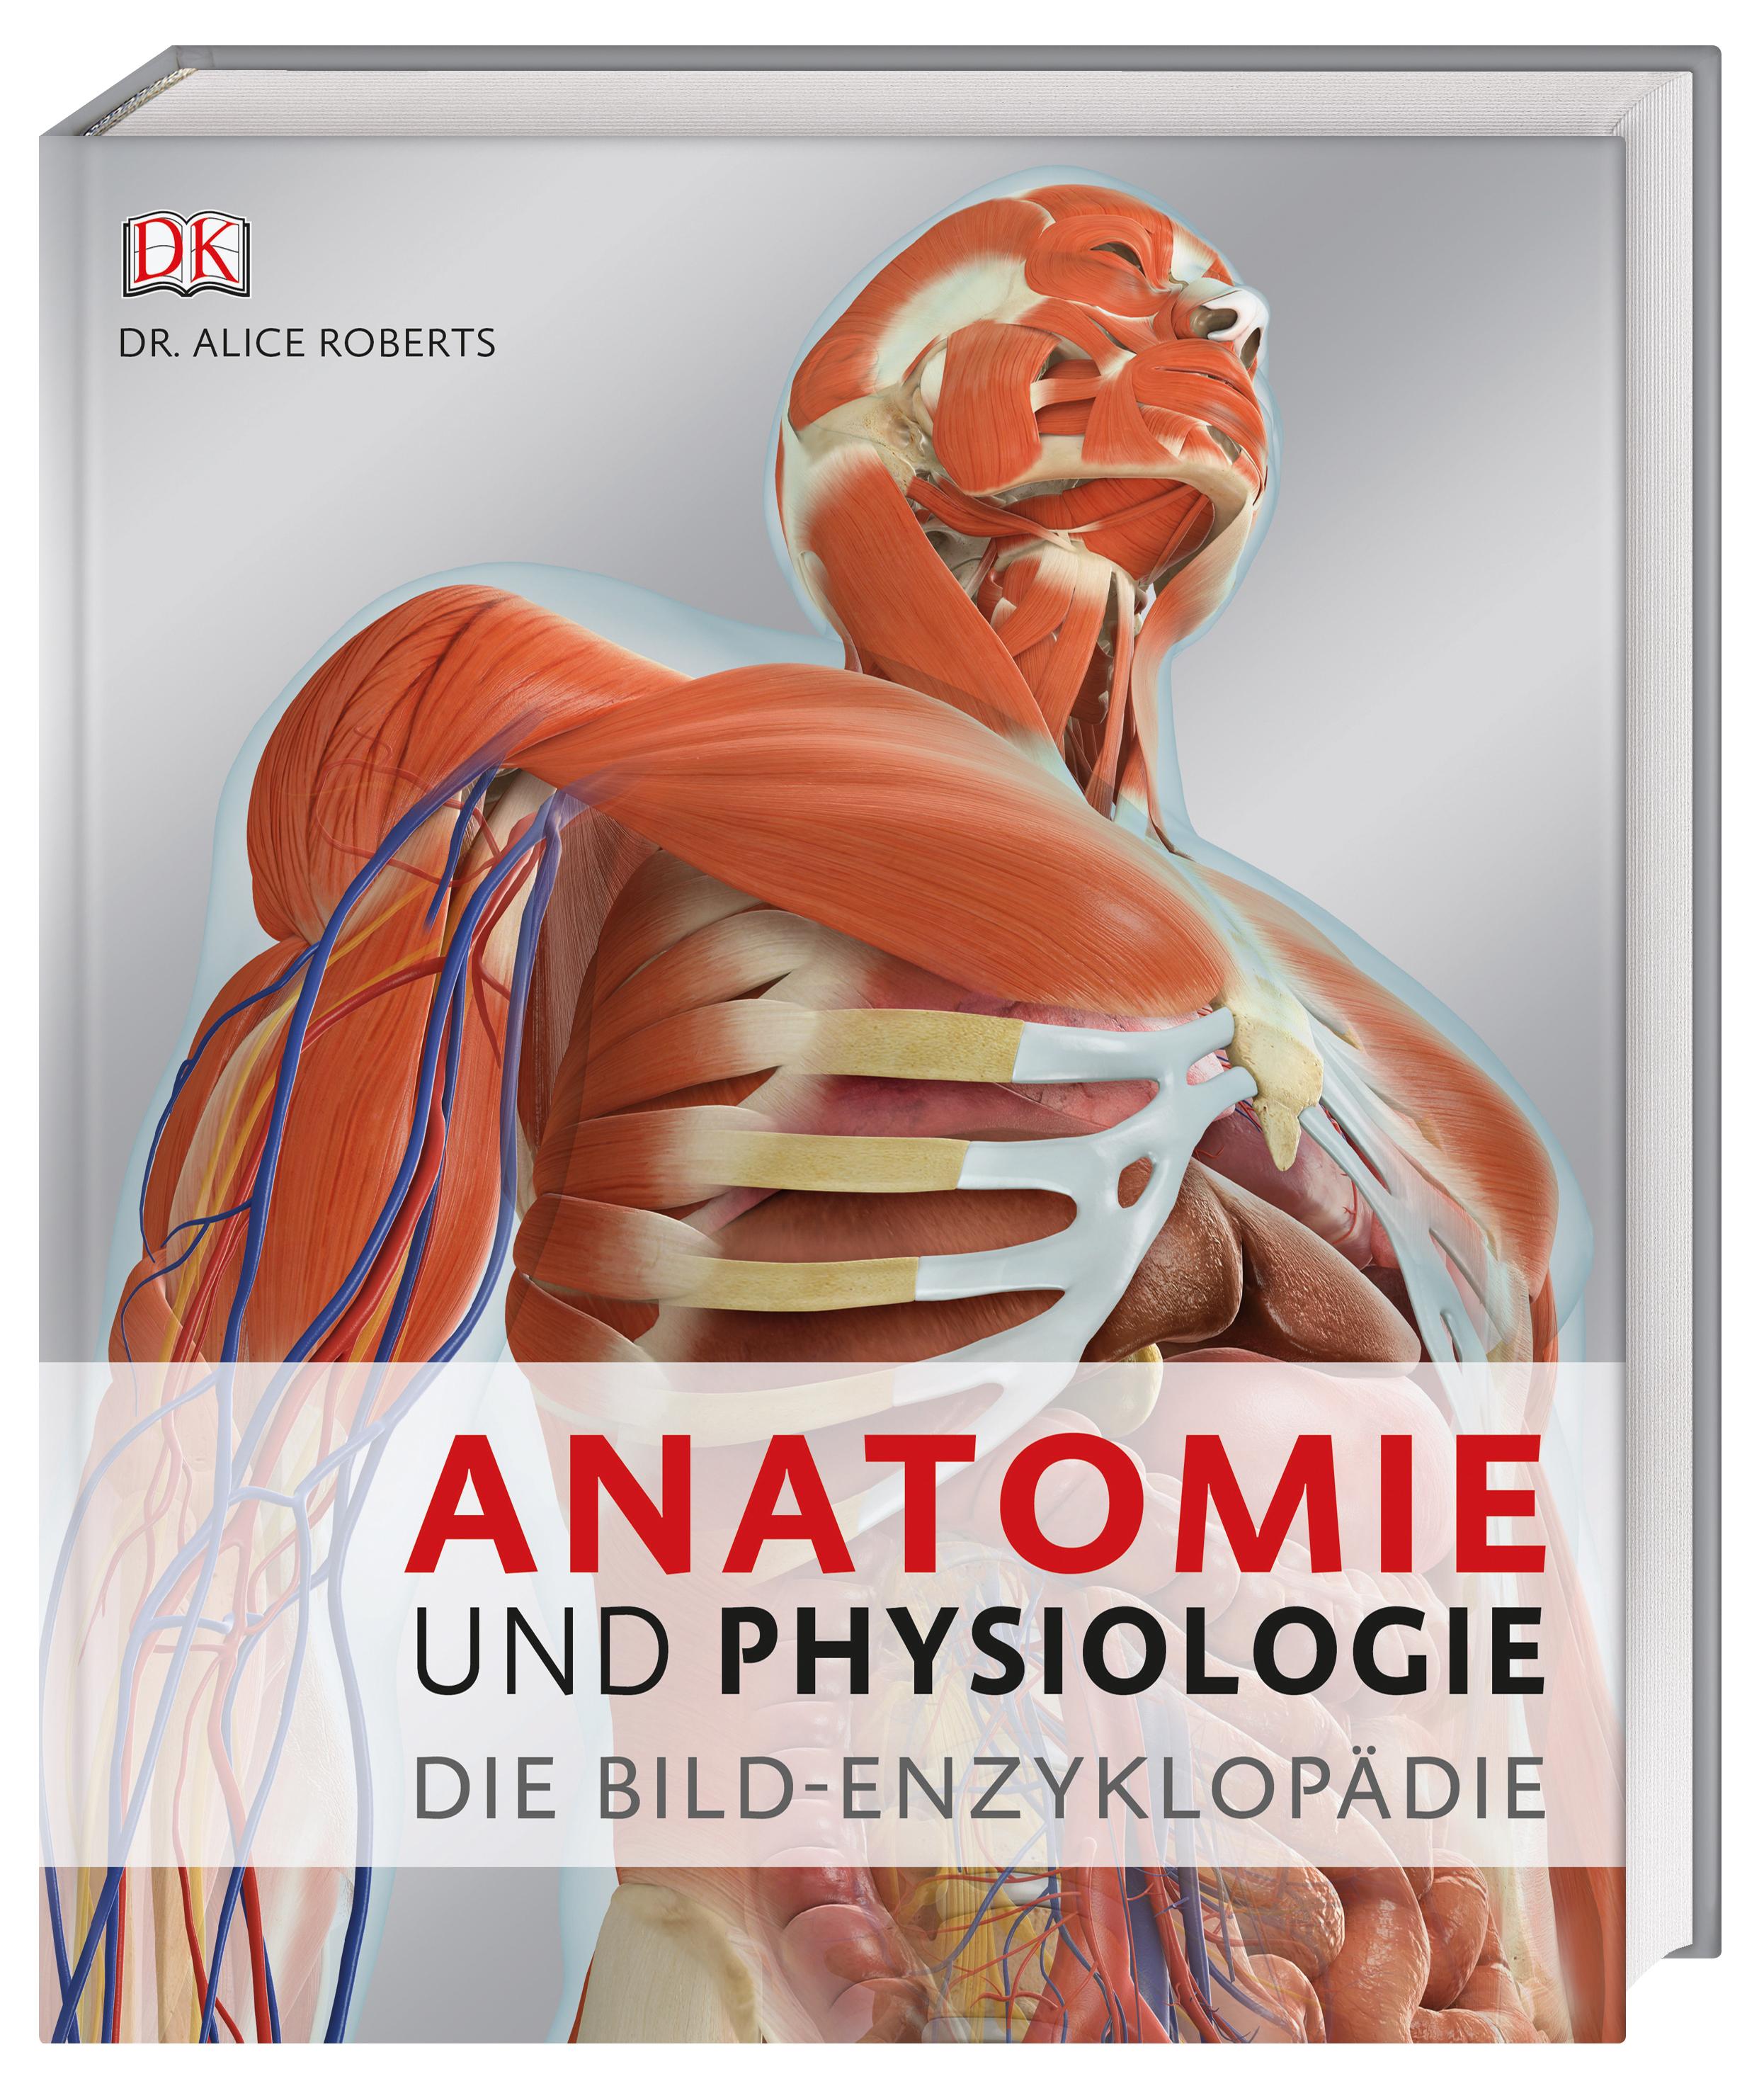 Großzügig Anatomie Und Physiologie Kapitel 1 Test Fotos ...